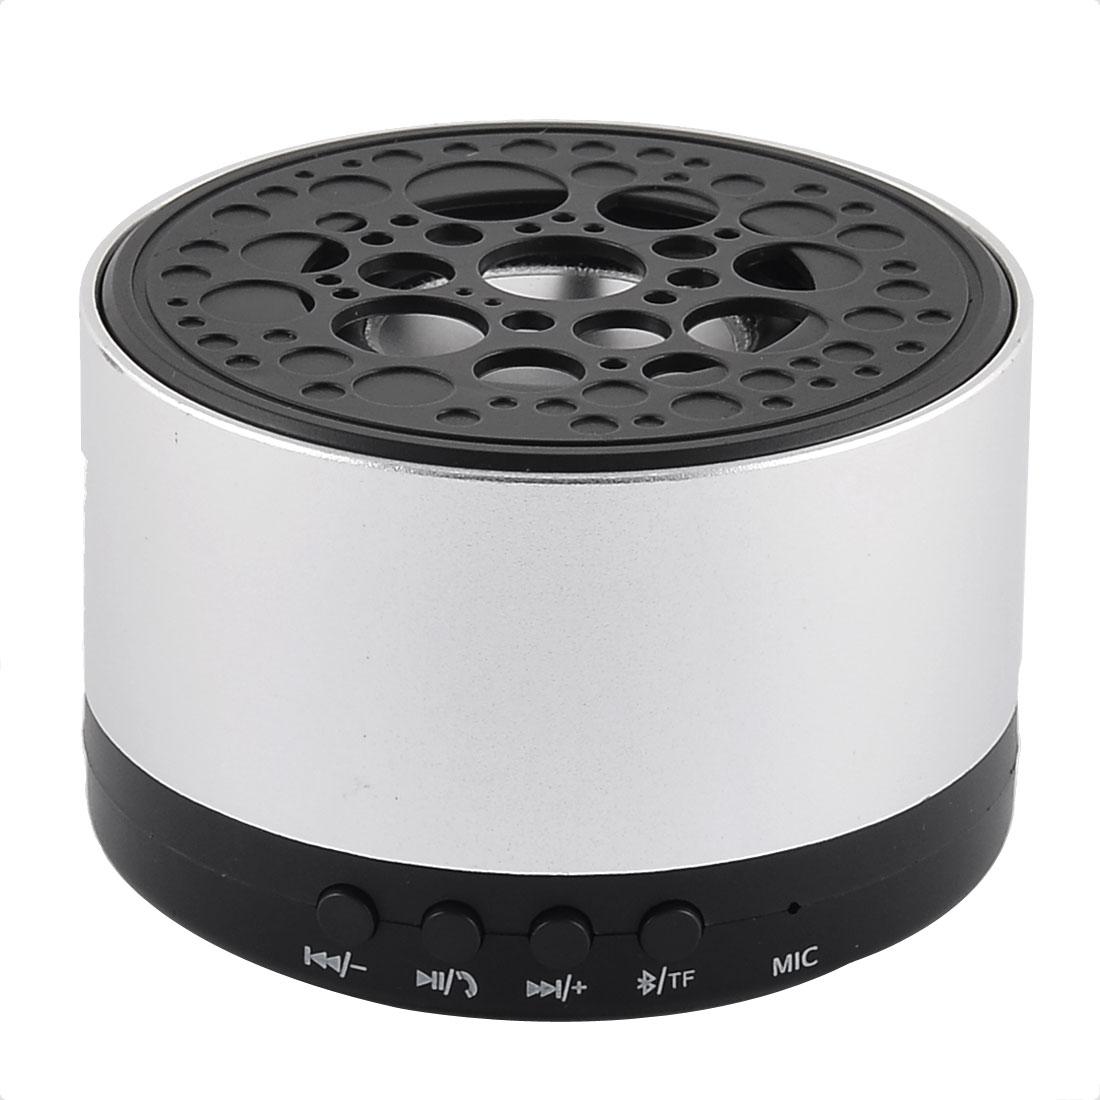 Portable Rechargeable Wireless Water Resistant Dustproof bluetooth Speaker Silver Tone